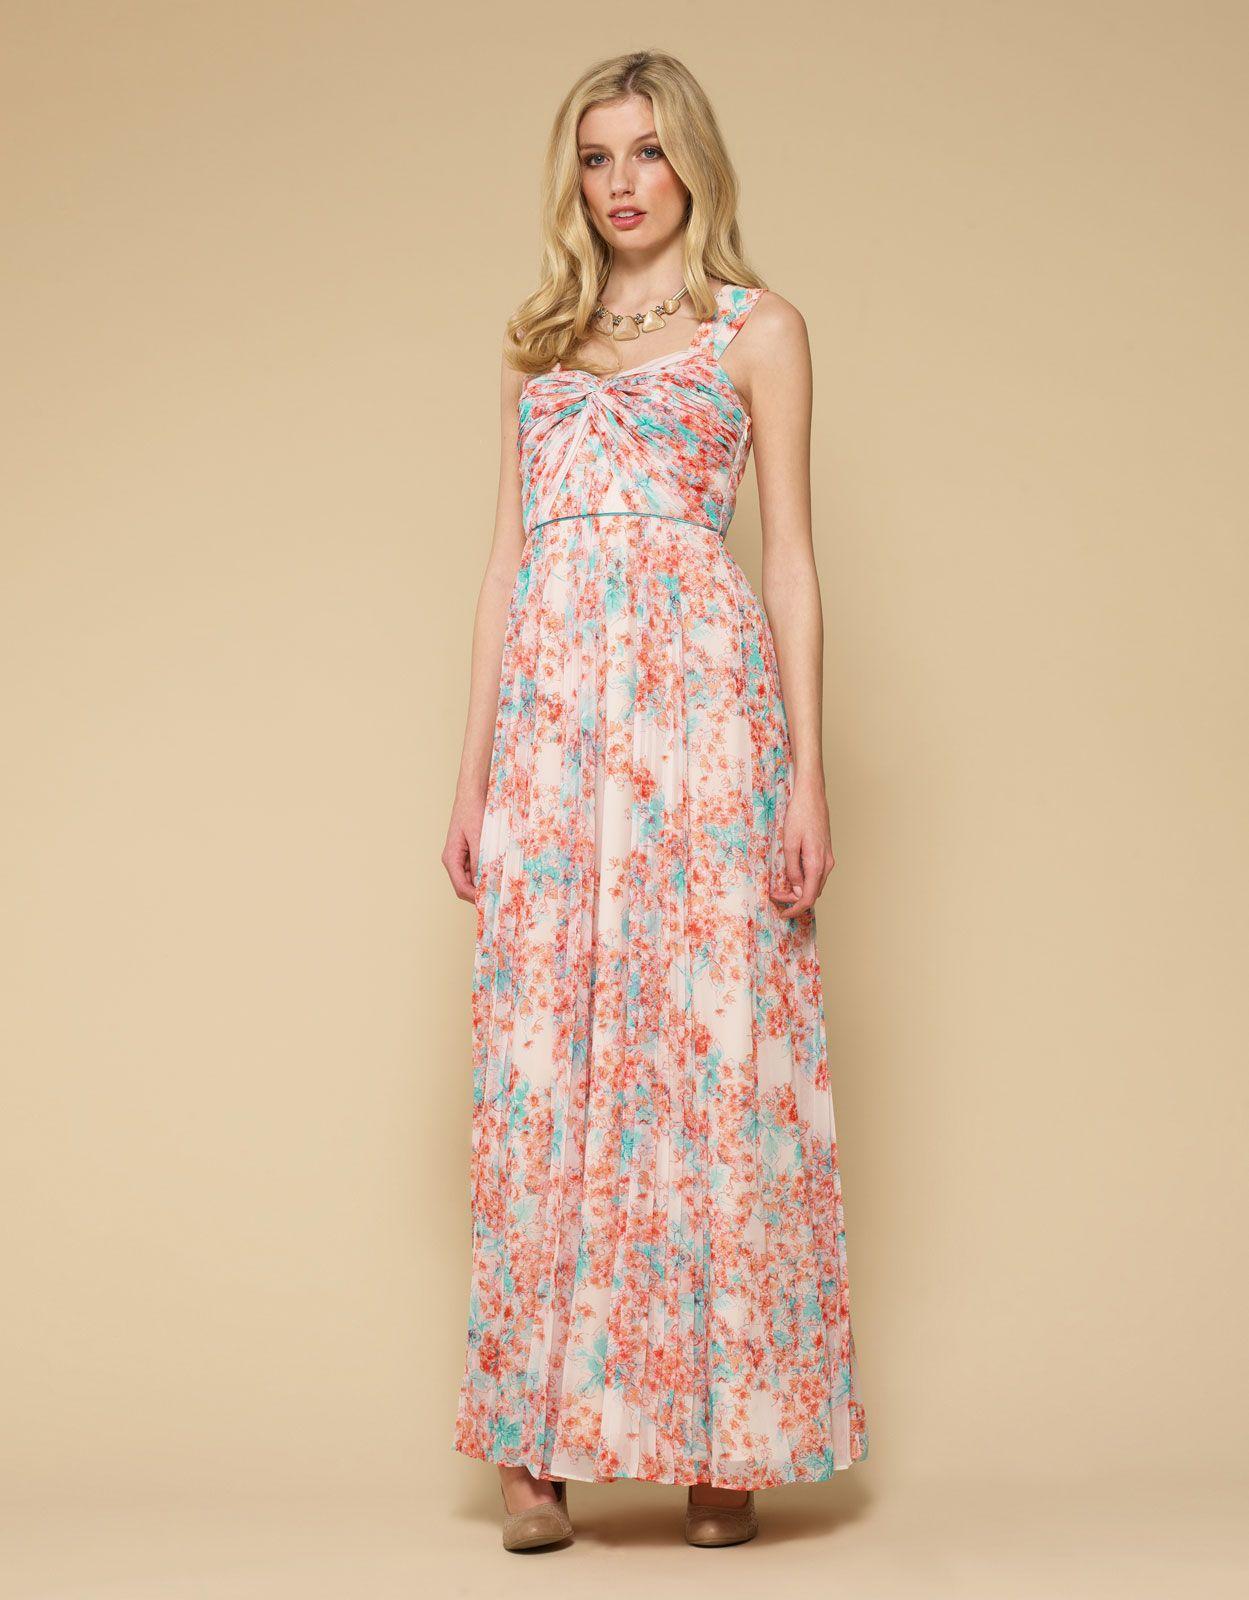 Monsoon   Women & children's clothing. Monsoon ClothingWoman DressesFashion DressesMaxi  Dresses UkBeautiful ...